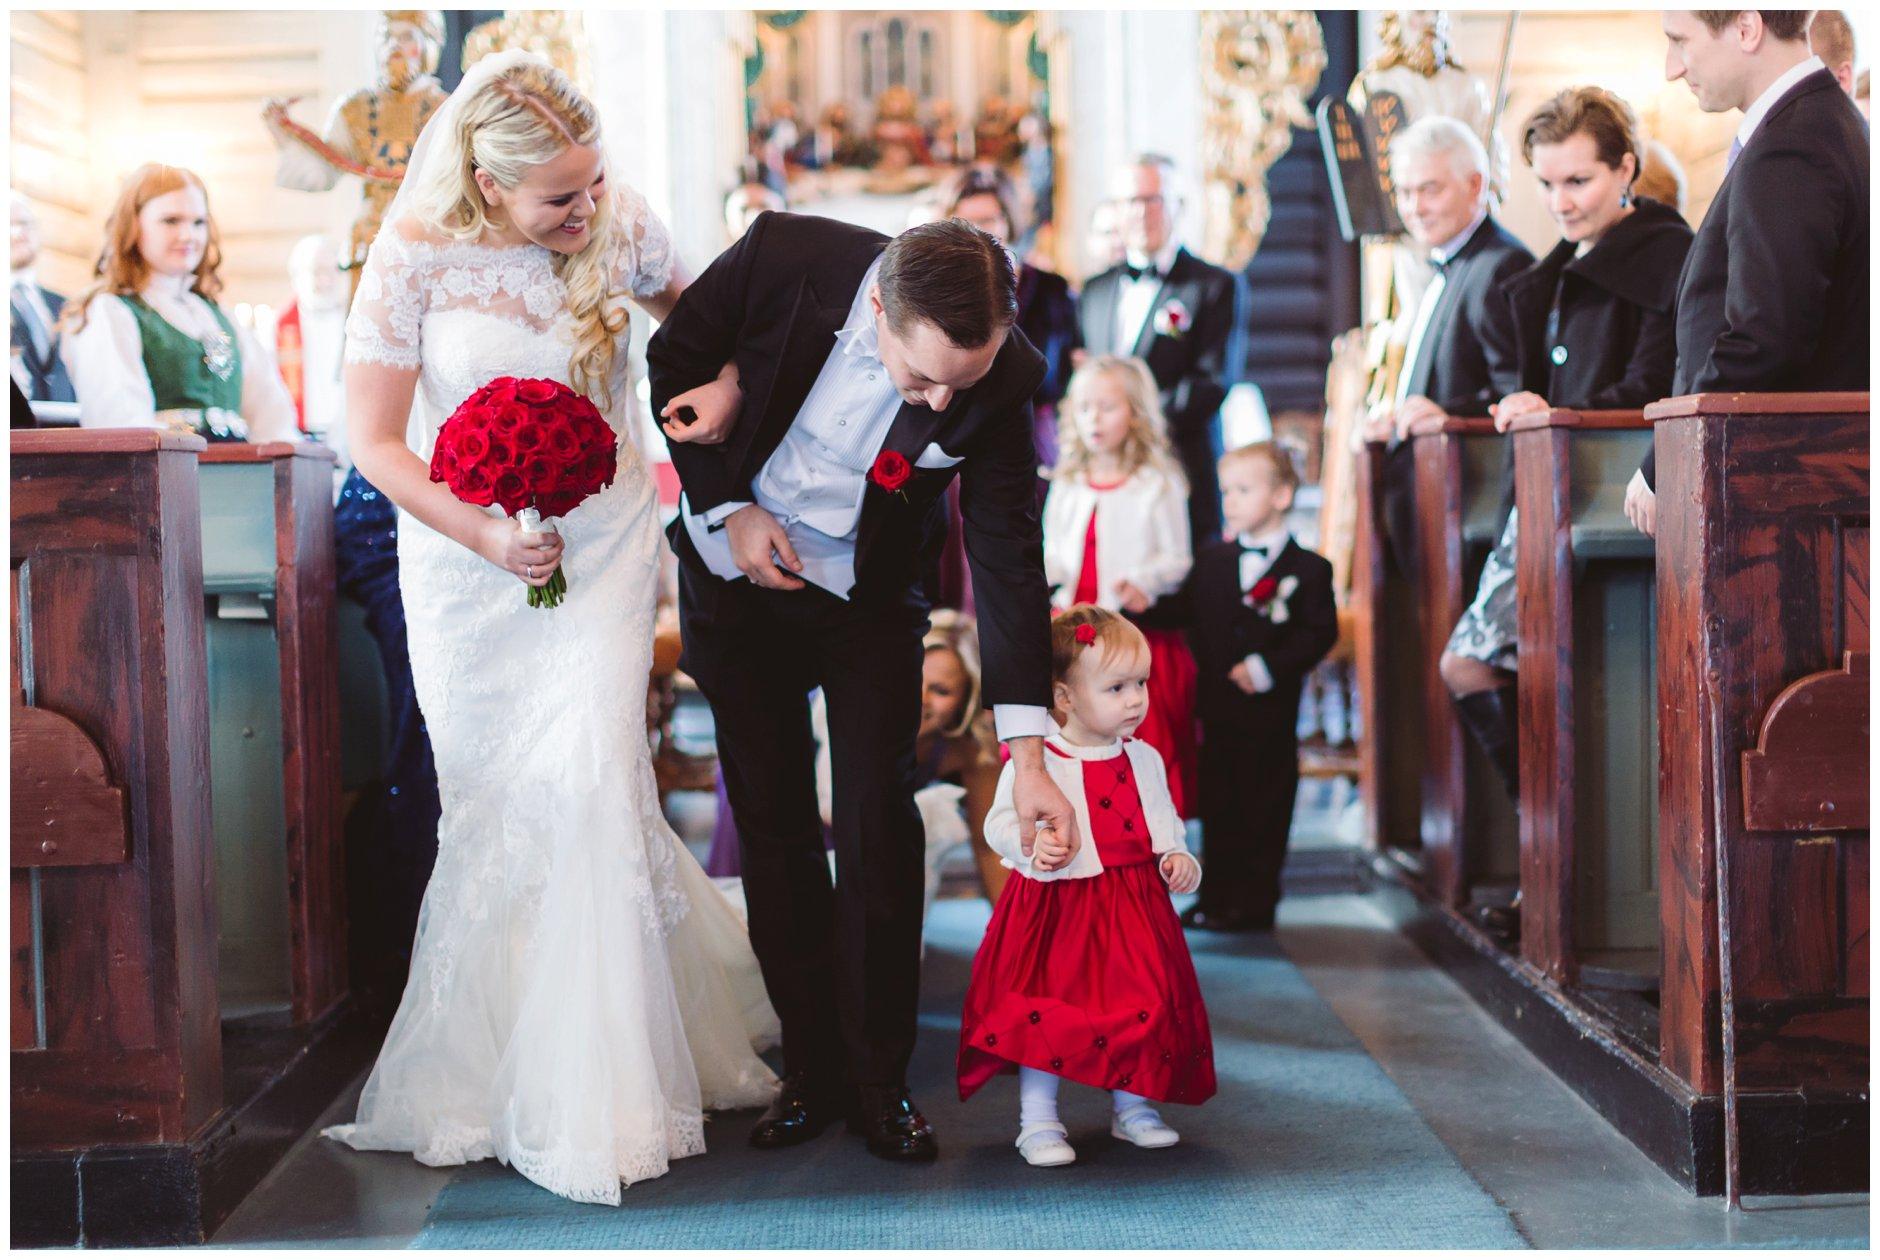 Vinterbryllup og vielse i Drøbak kirke med barn